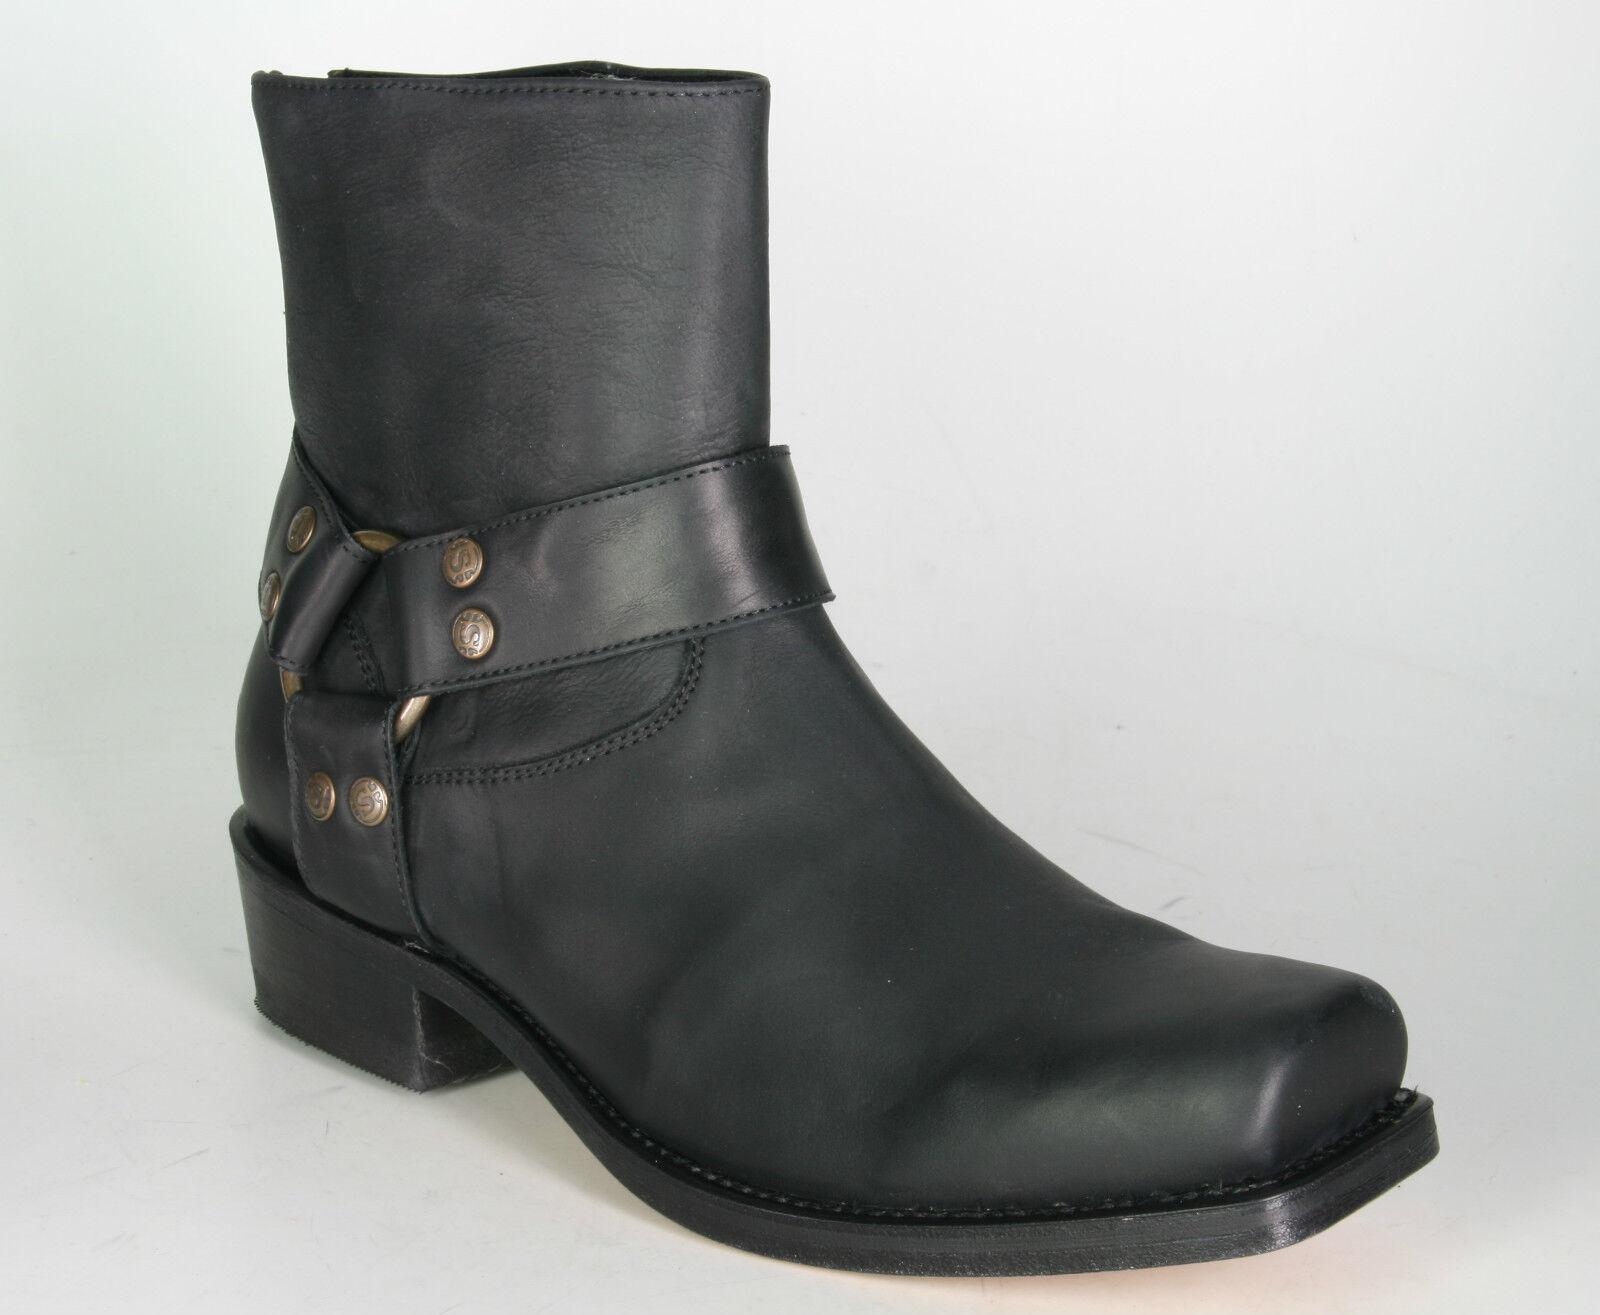 12266 sendra Ankle Stiefel Blaus Santos Dark